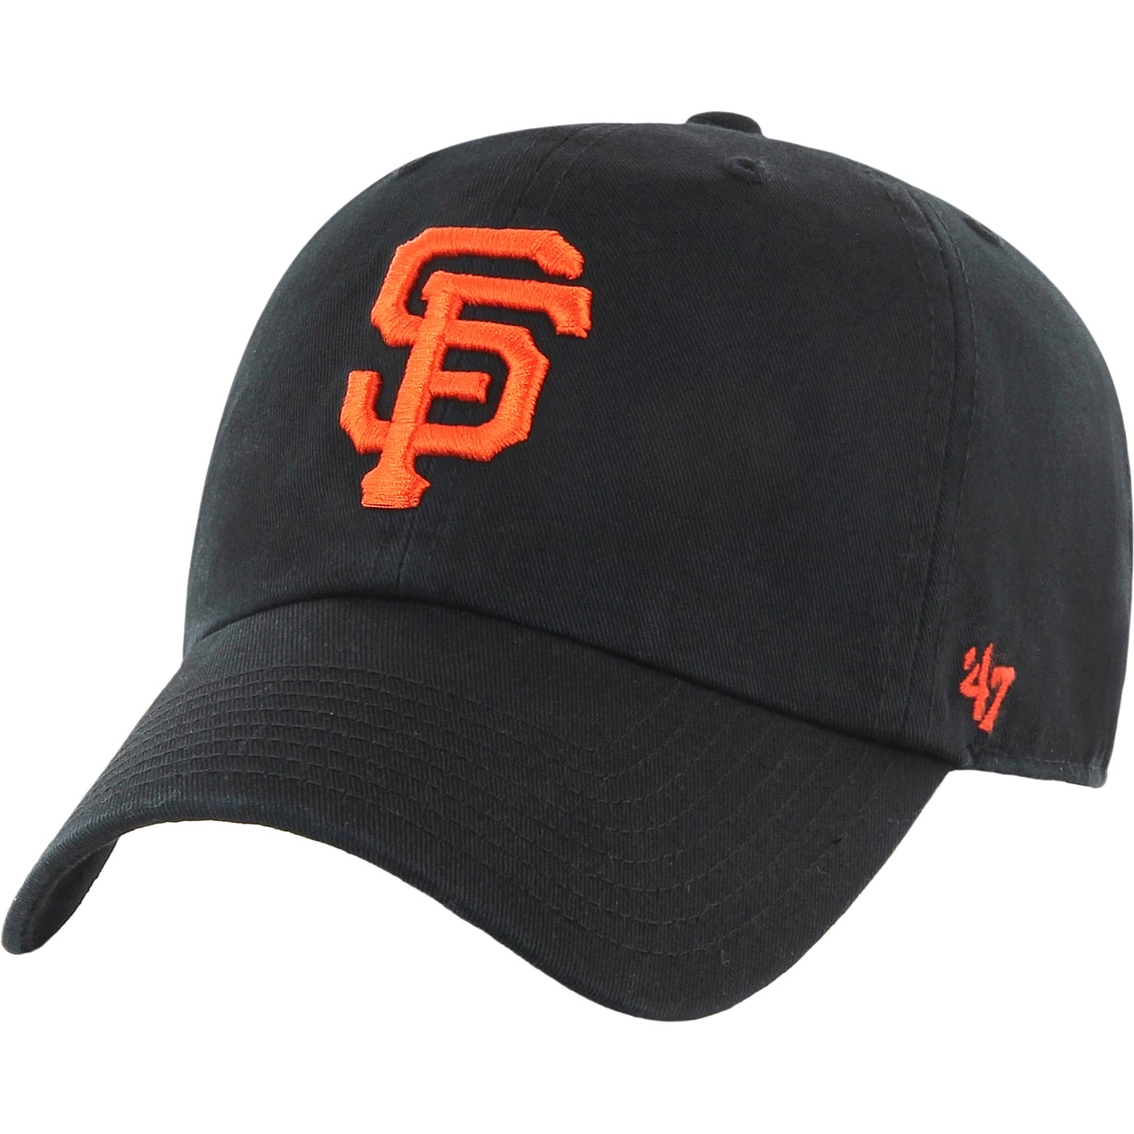 low priced d13cc 7889d 47 Brand Mlb San Francisco Giants Clean Up Baseball Cap ...